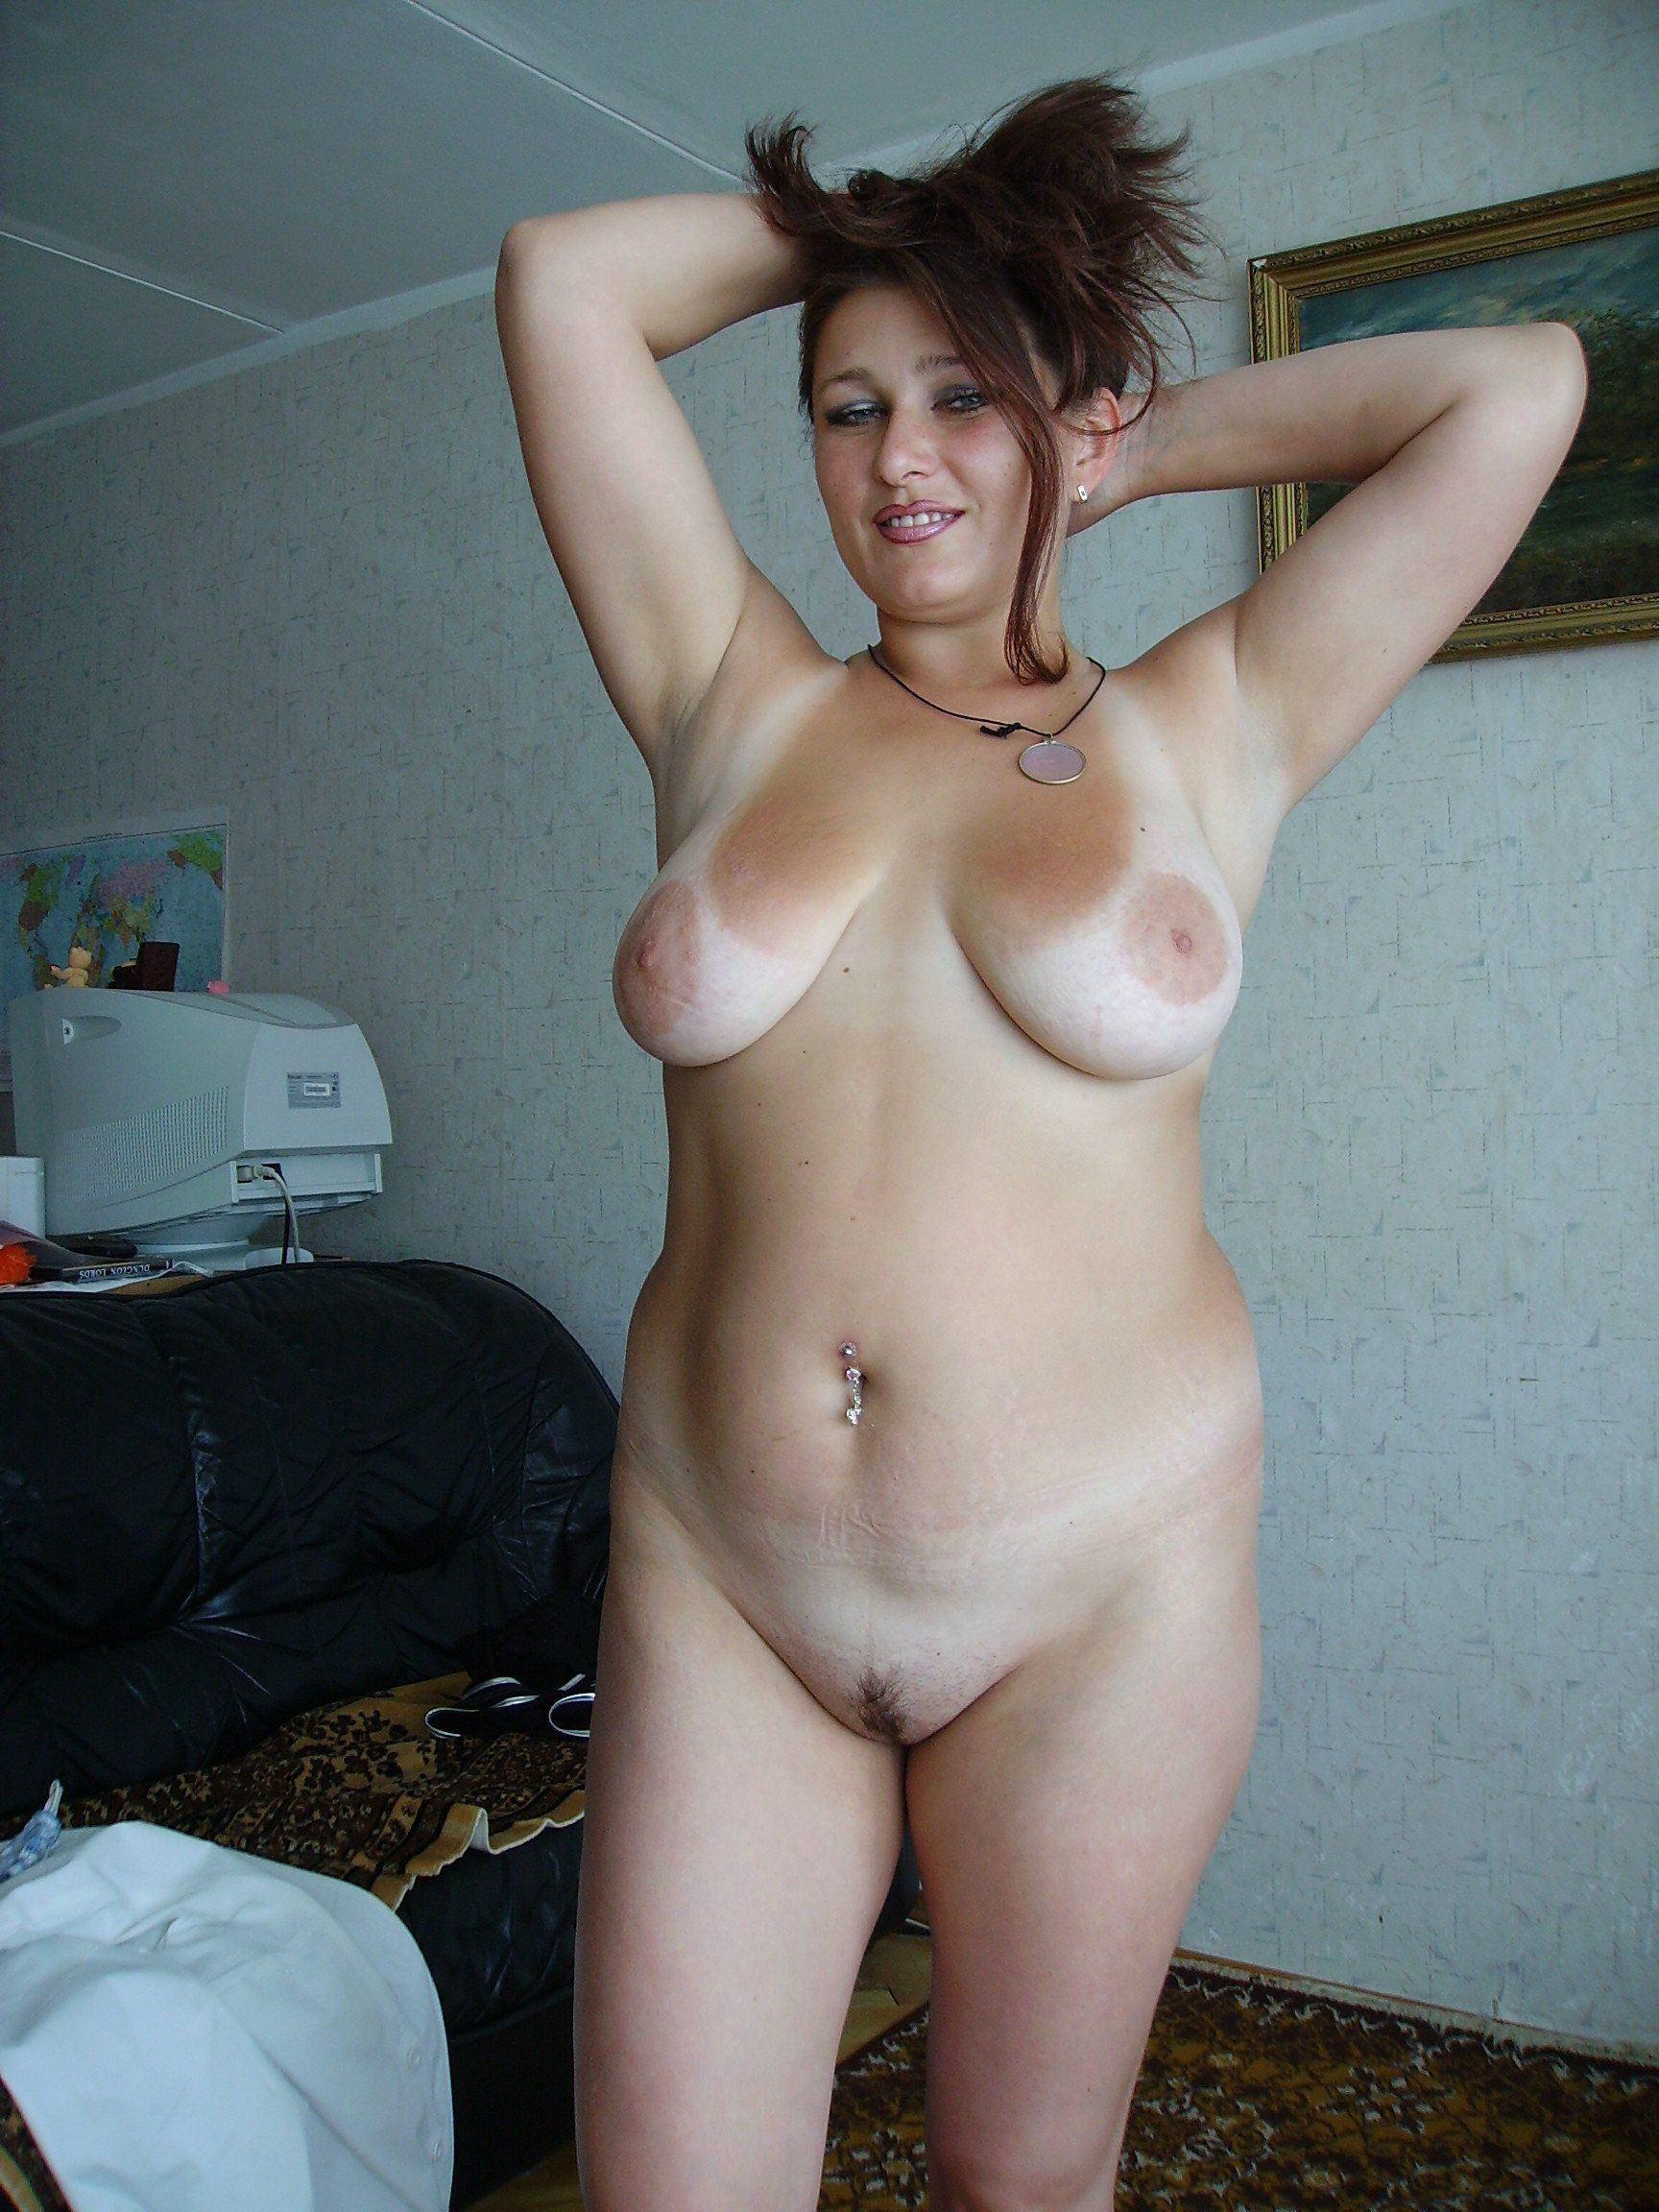 hairy lesbian double dildo